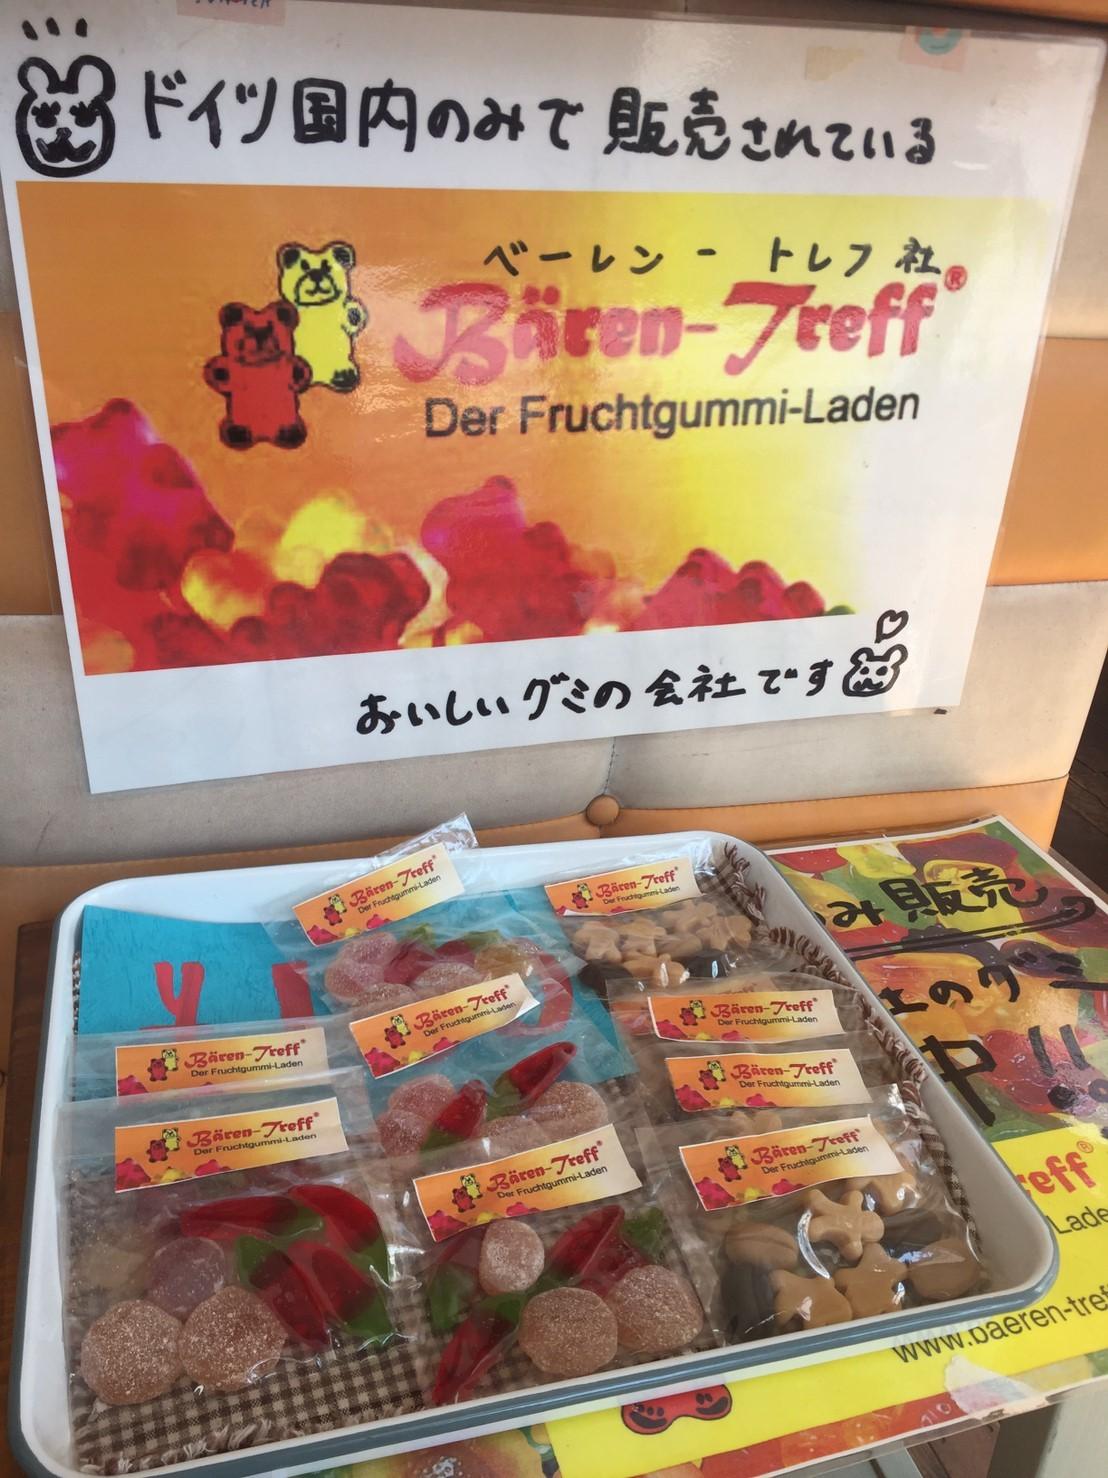 Tottori カルマ  カルマ焼飯_e0115904_22120403.jpg